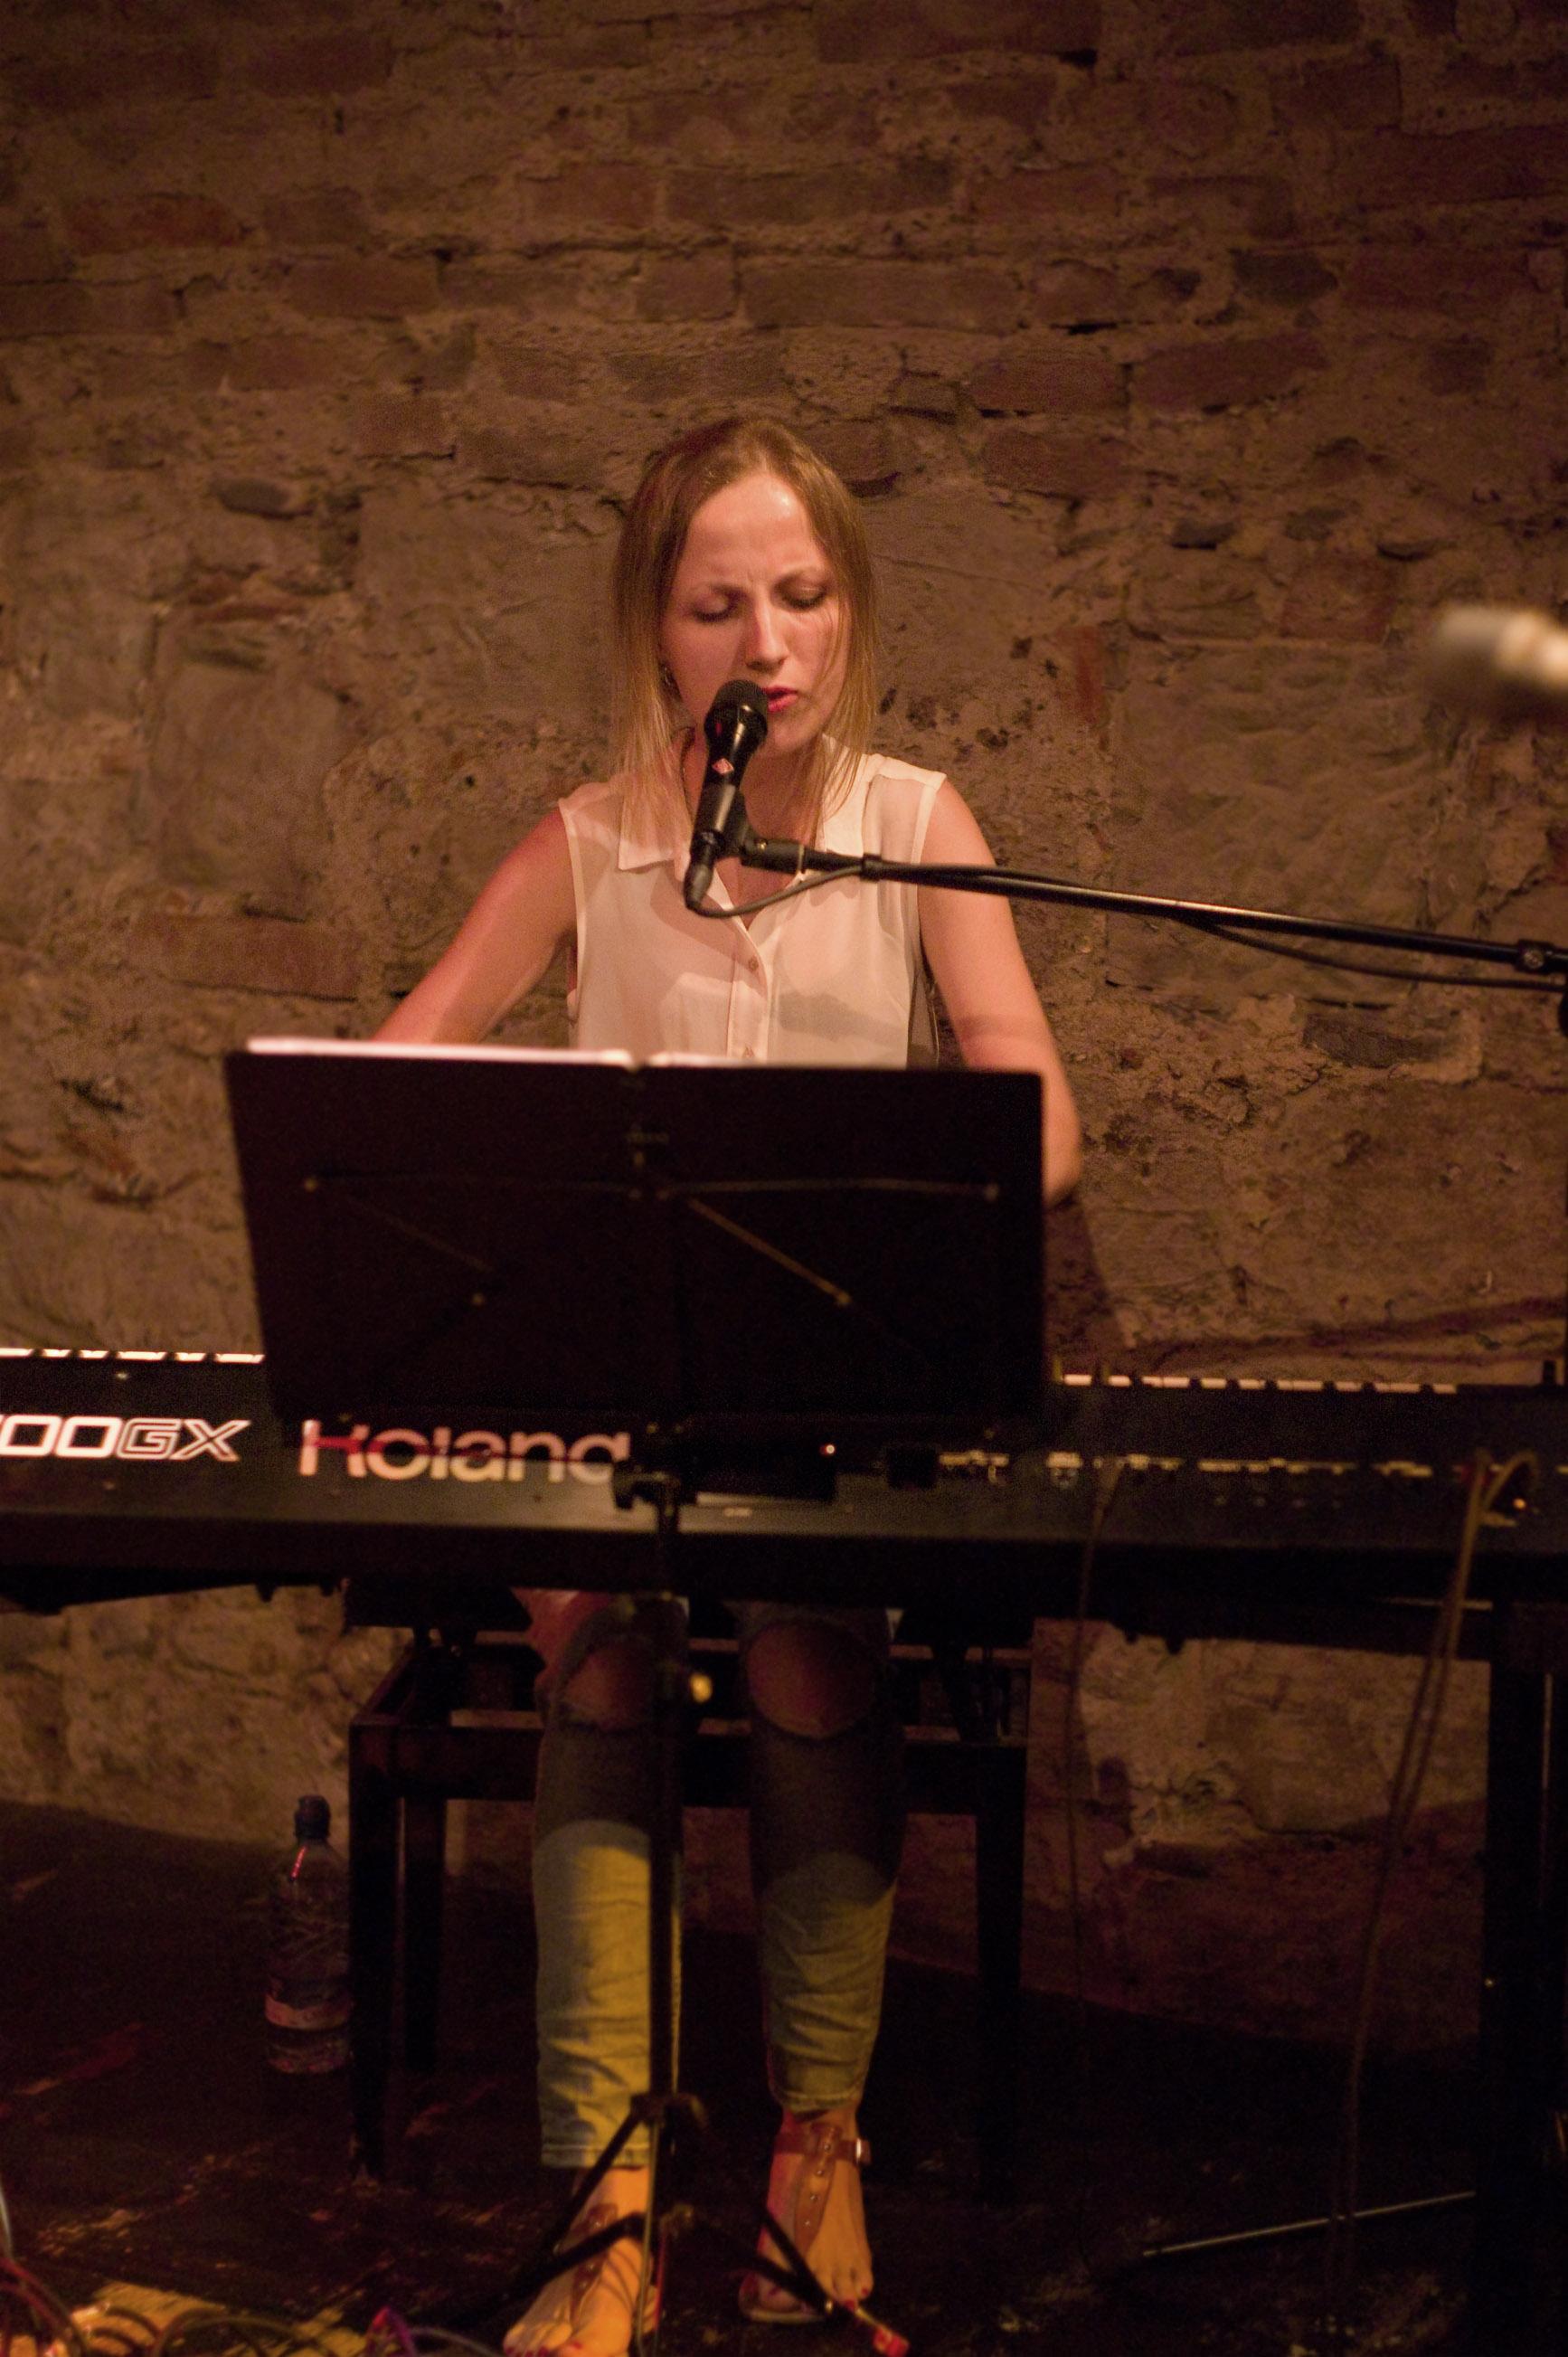 Vocal_ArtJahreskonzert_2015_Schülerin_Katya.jpg